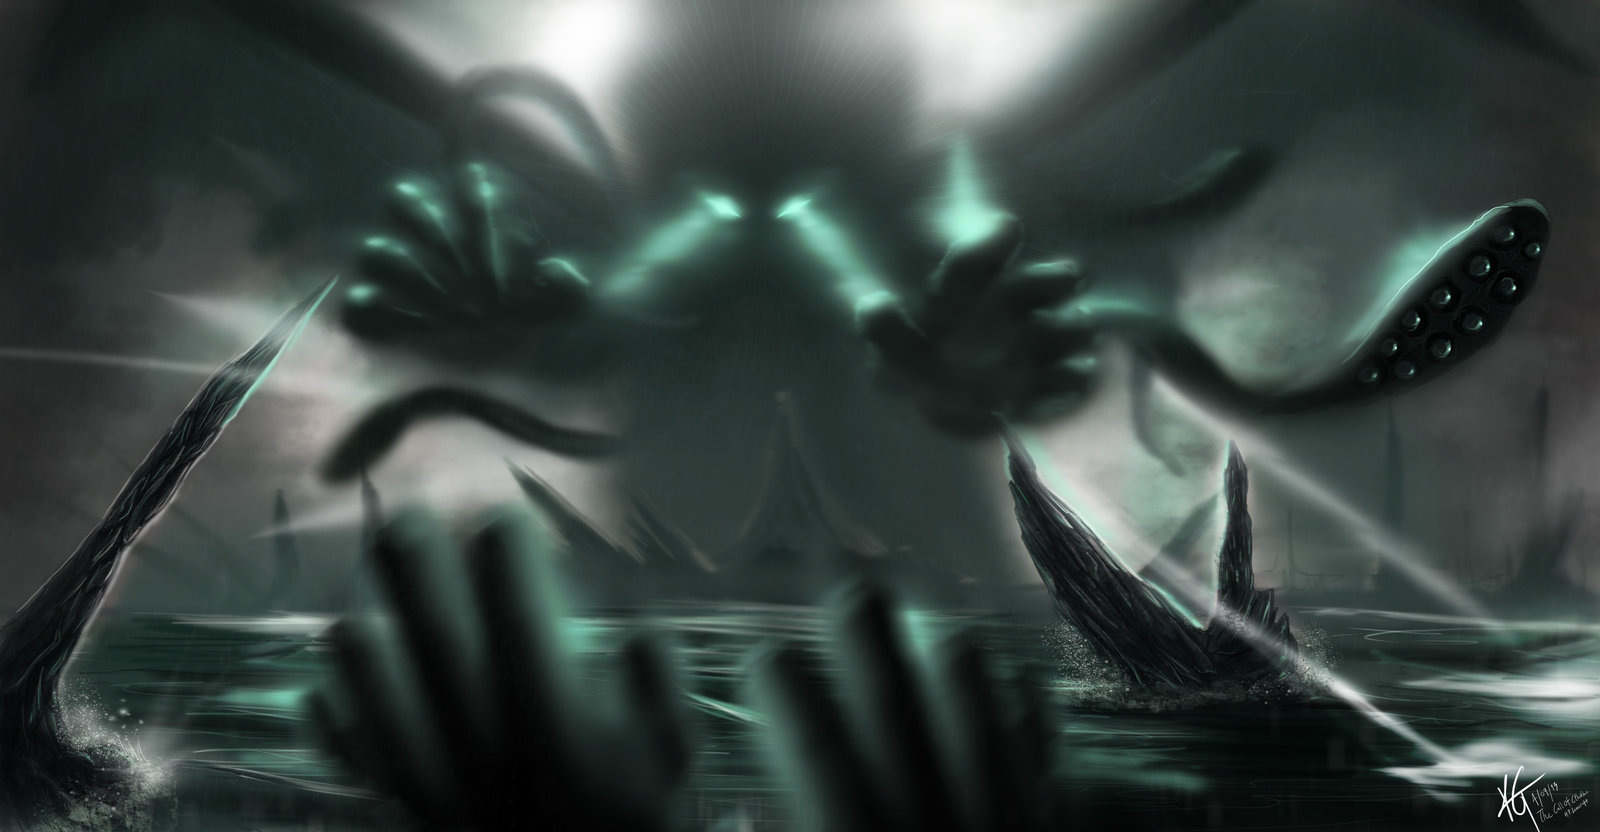 Hp Lovecraft Art Wallpapers: Call Of Cthulhu Wallpaper